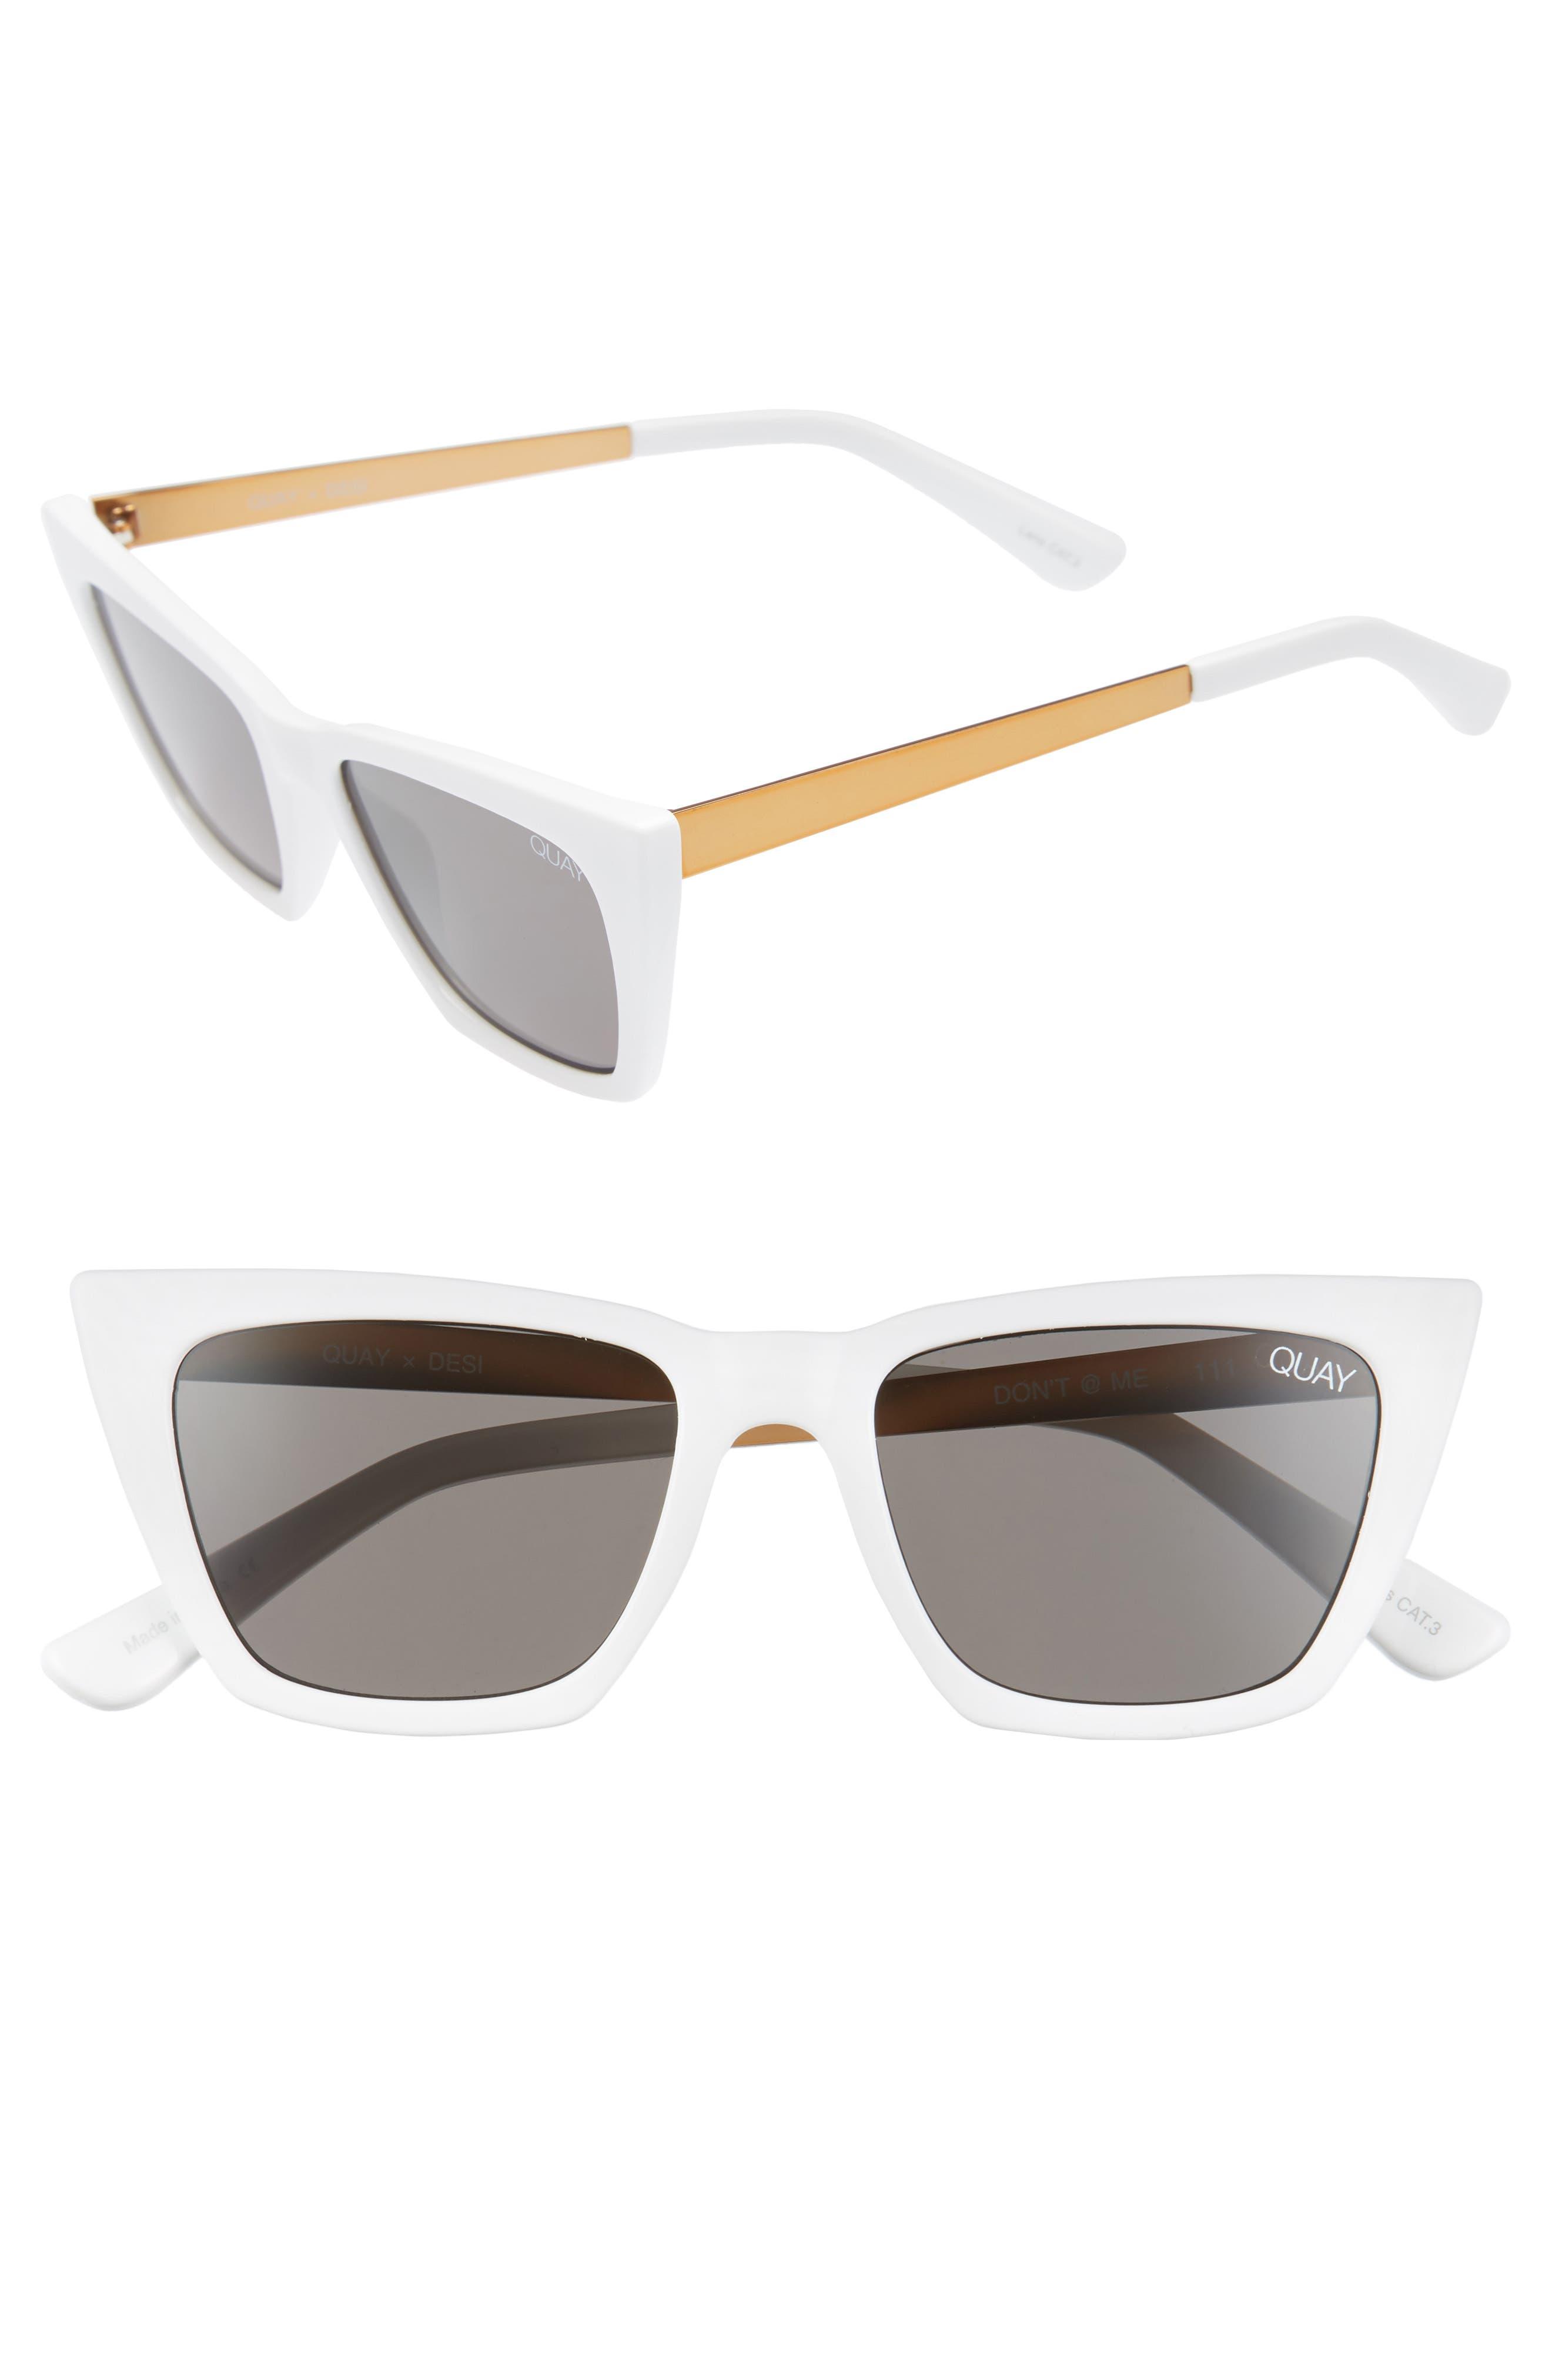 x Desi Perkins Don't @ Me 48mm Cat Eye Sunglasses,                         Main,                         color, White/ Smoke